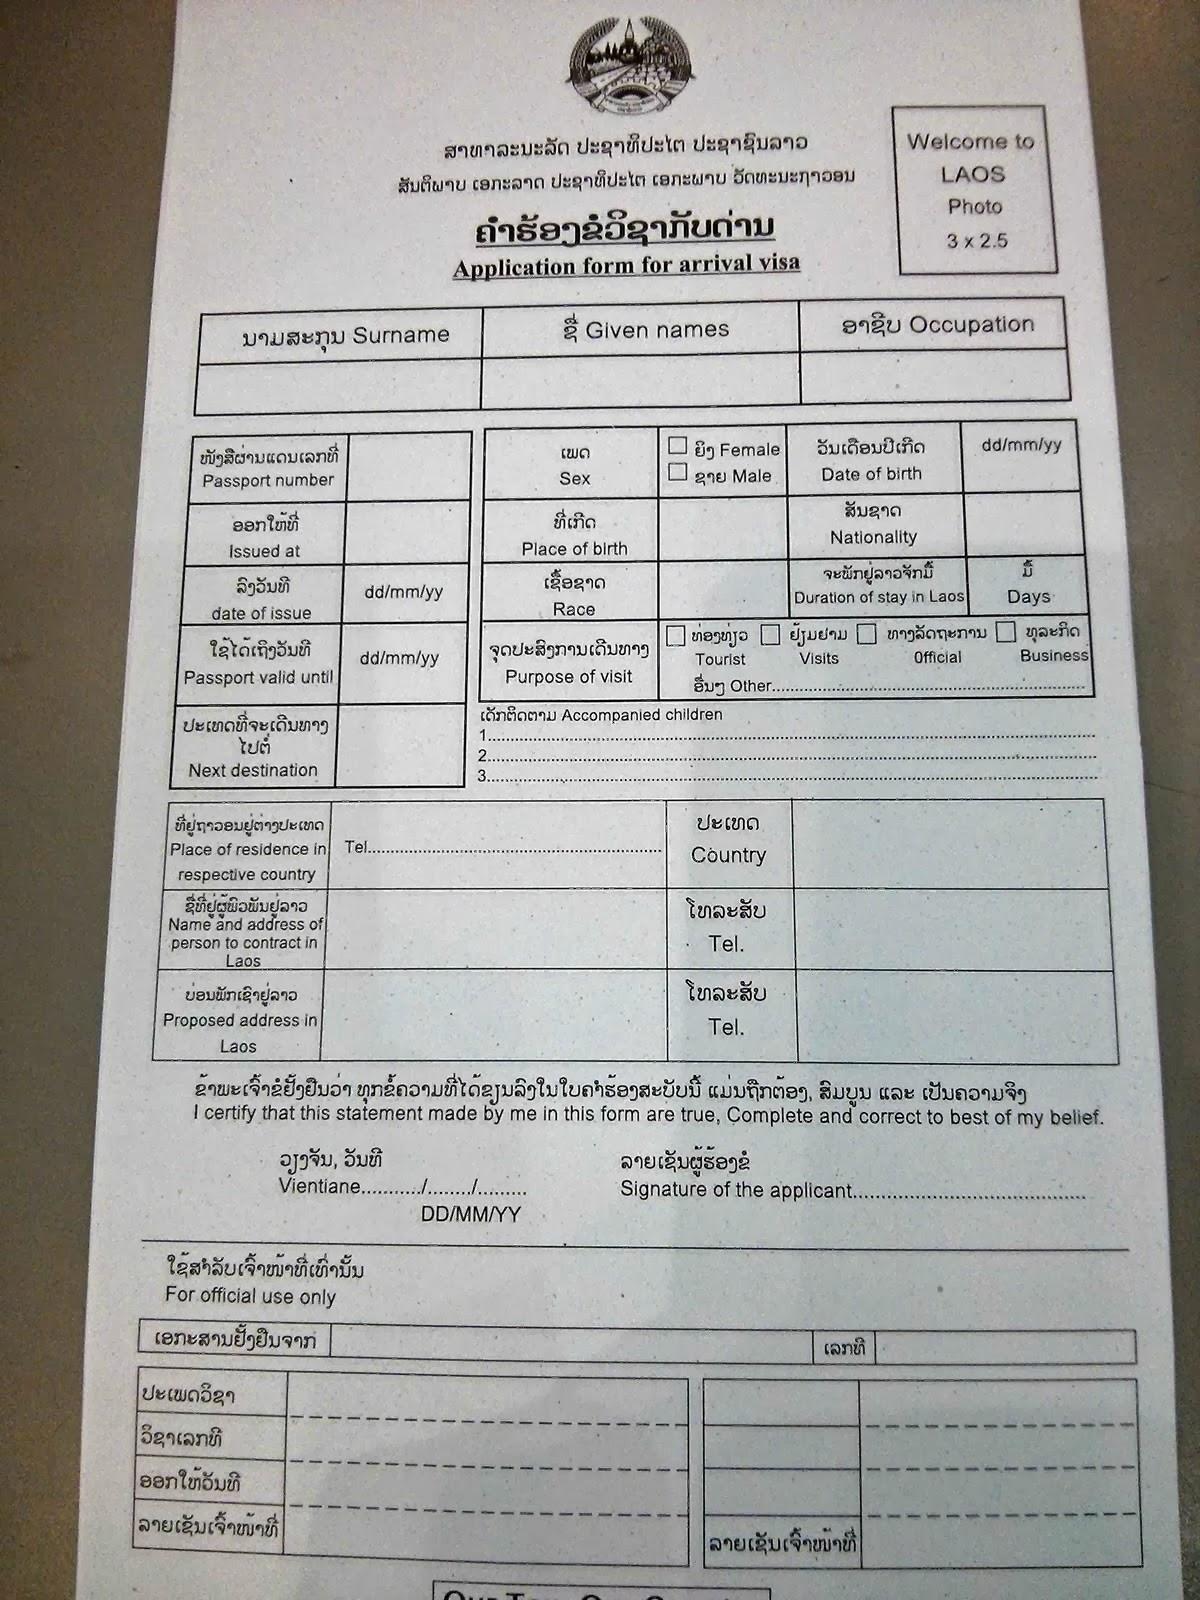 Visa to Laos - Visa on-arrival for Laos